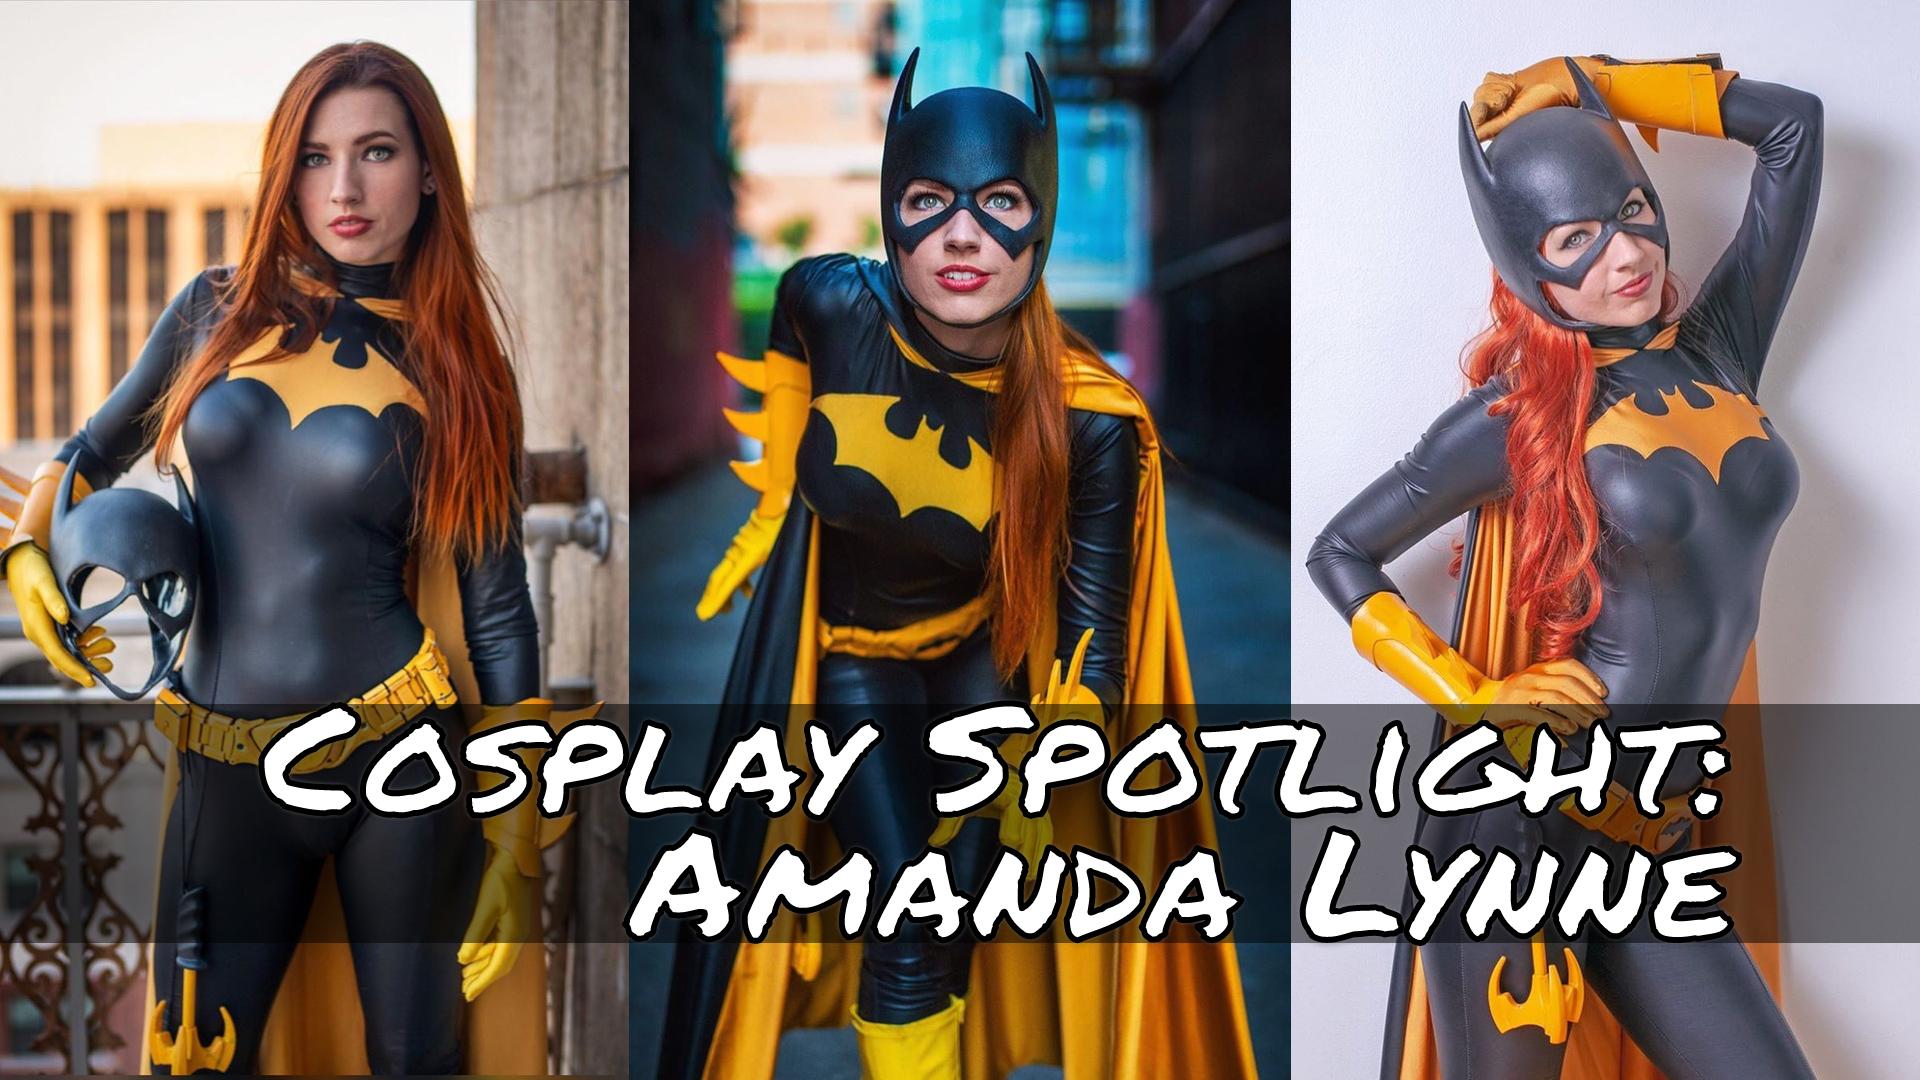 Cosplay Spotlight on Amanda Lynne. Photo: Johnny Porsche, modelandmuse.com